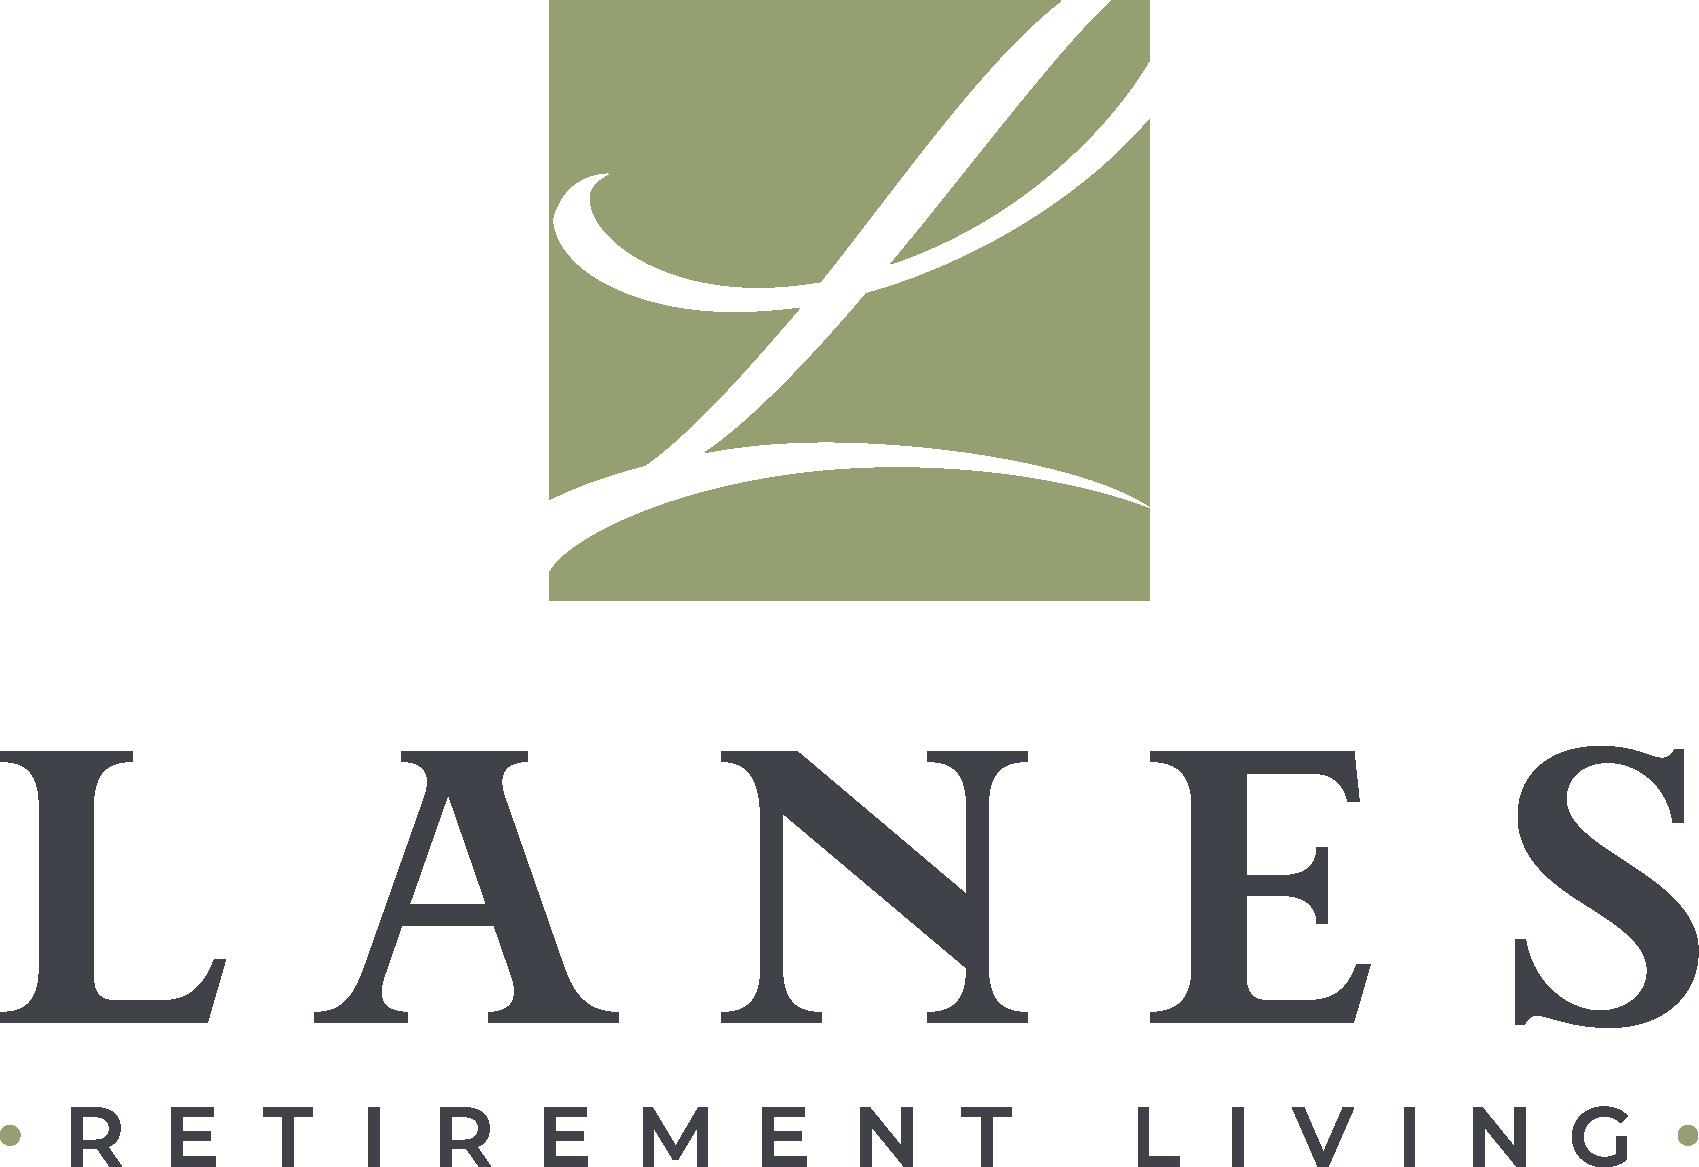 LANES Vertical Primary Logo RBG.png